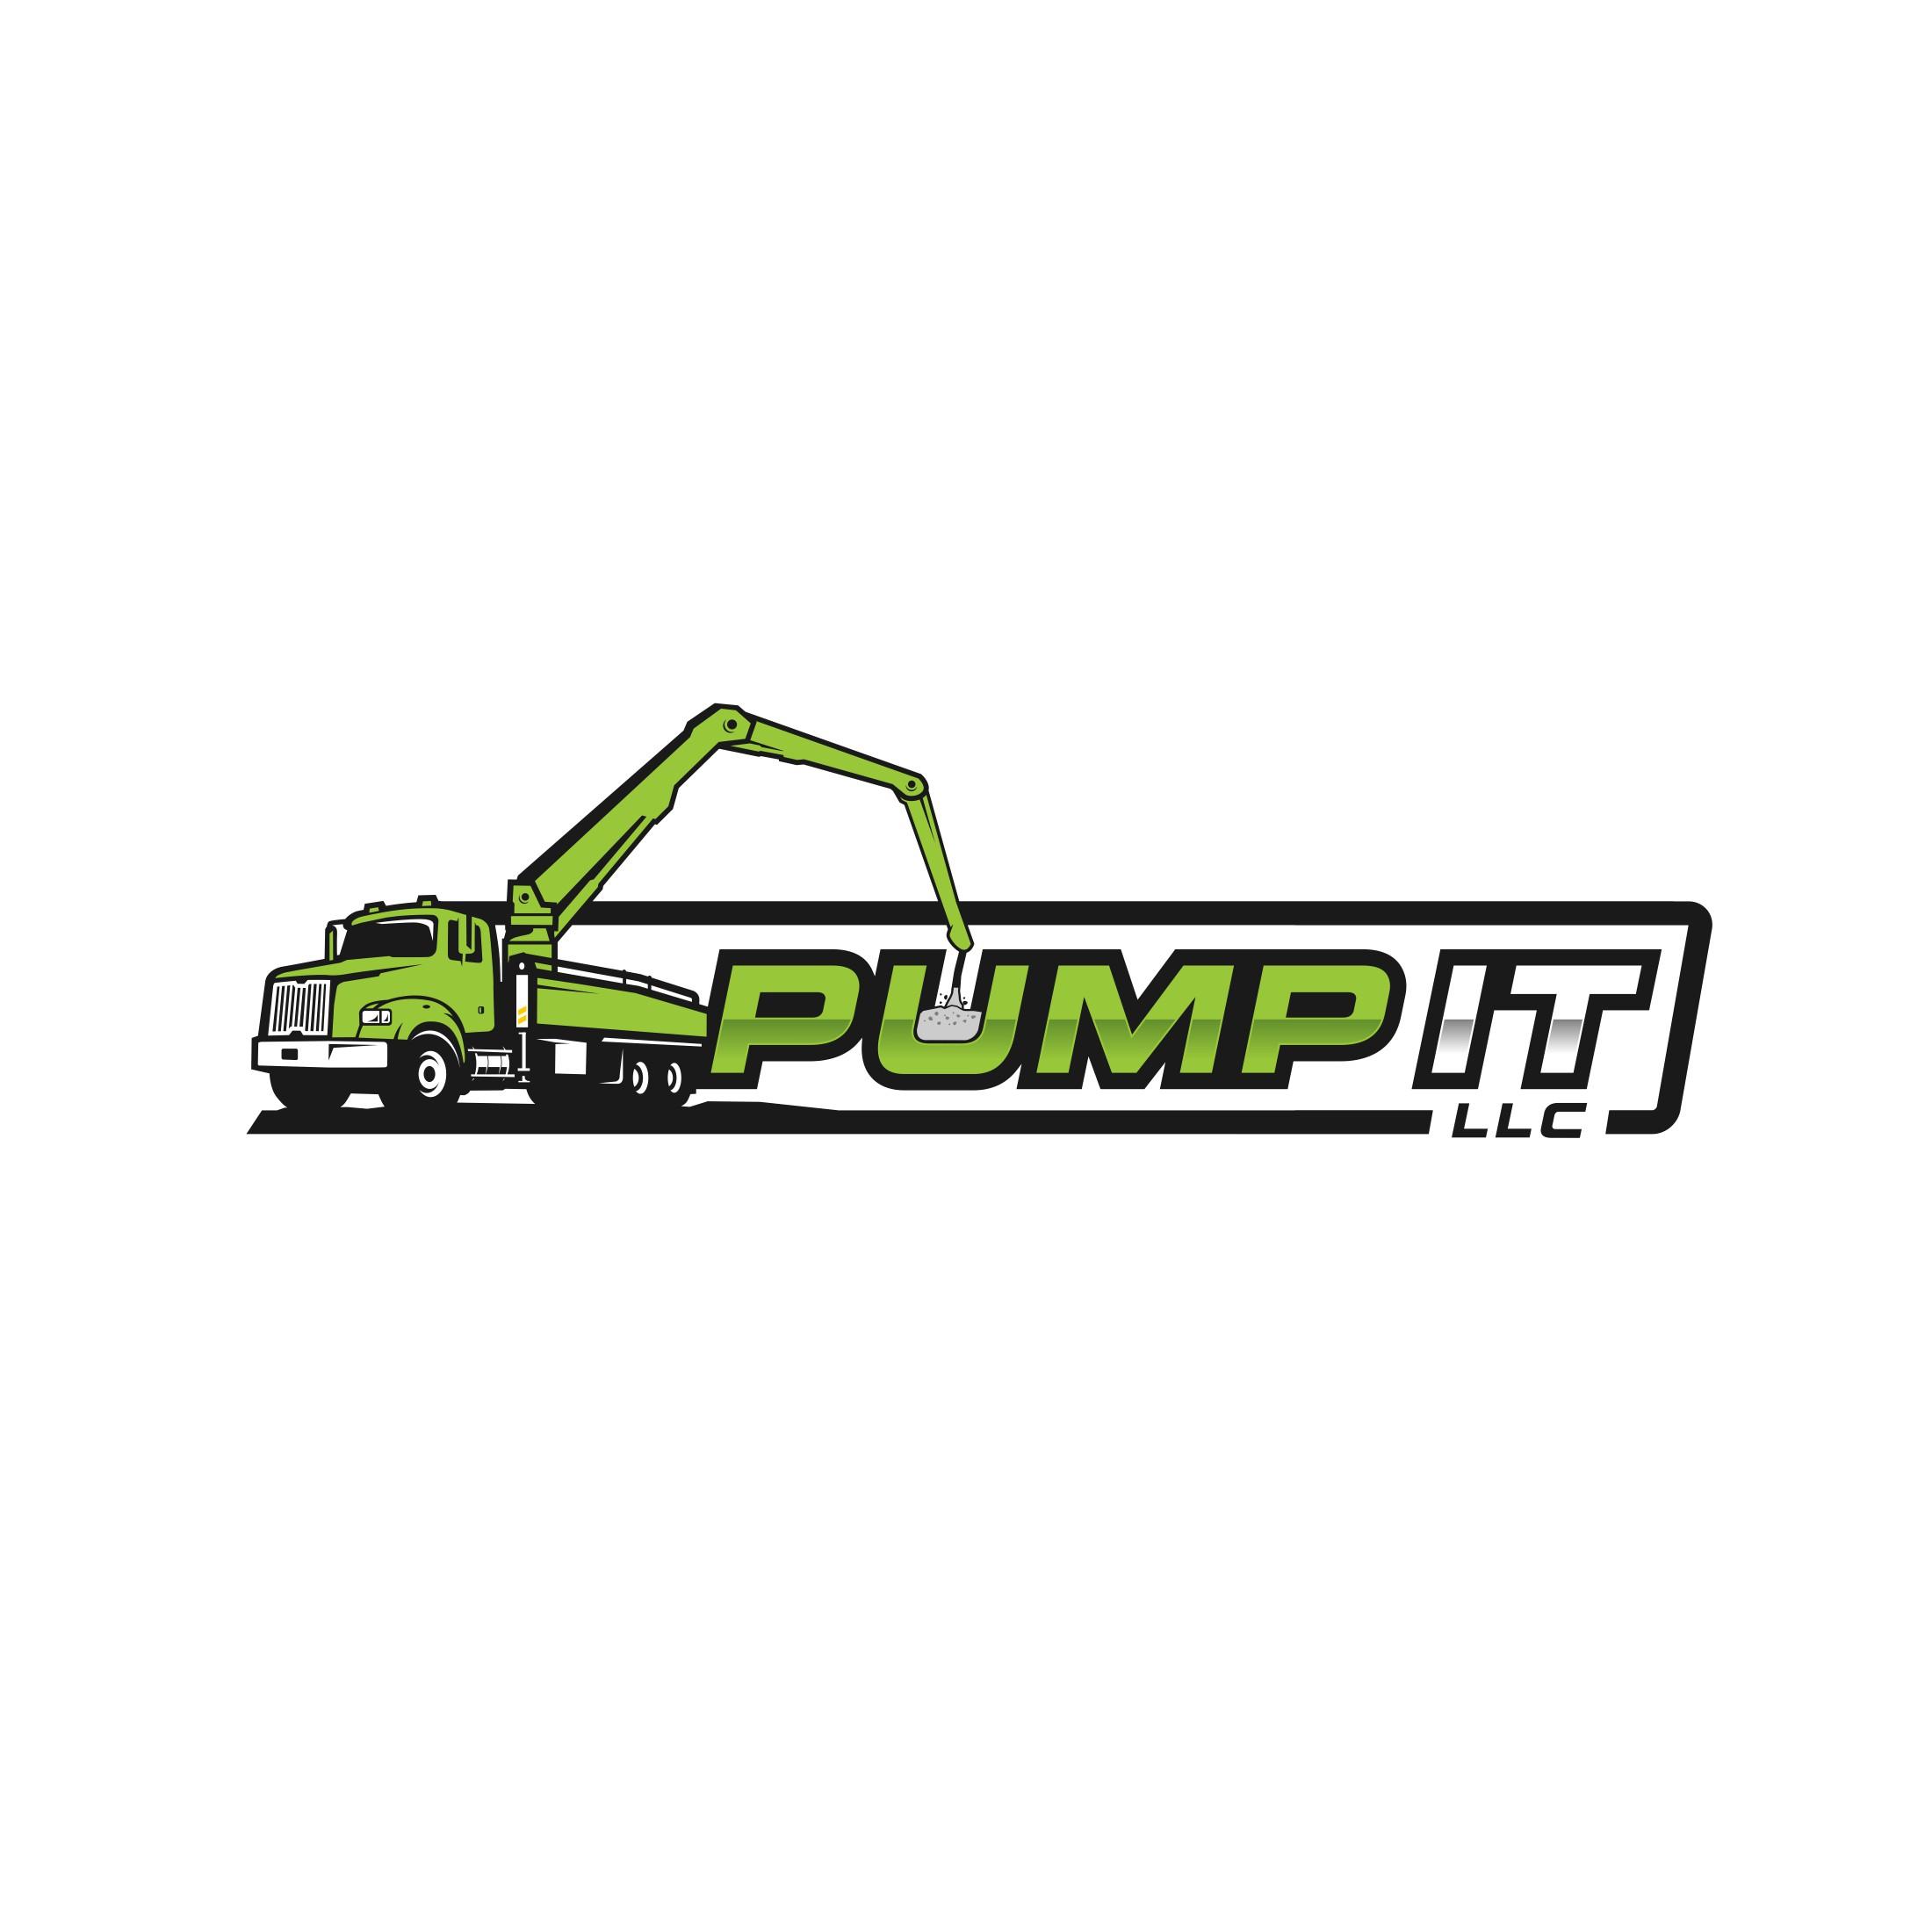 Design a logo for a new concrete pumping business